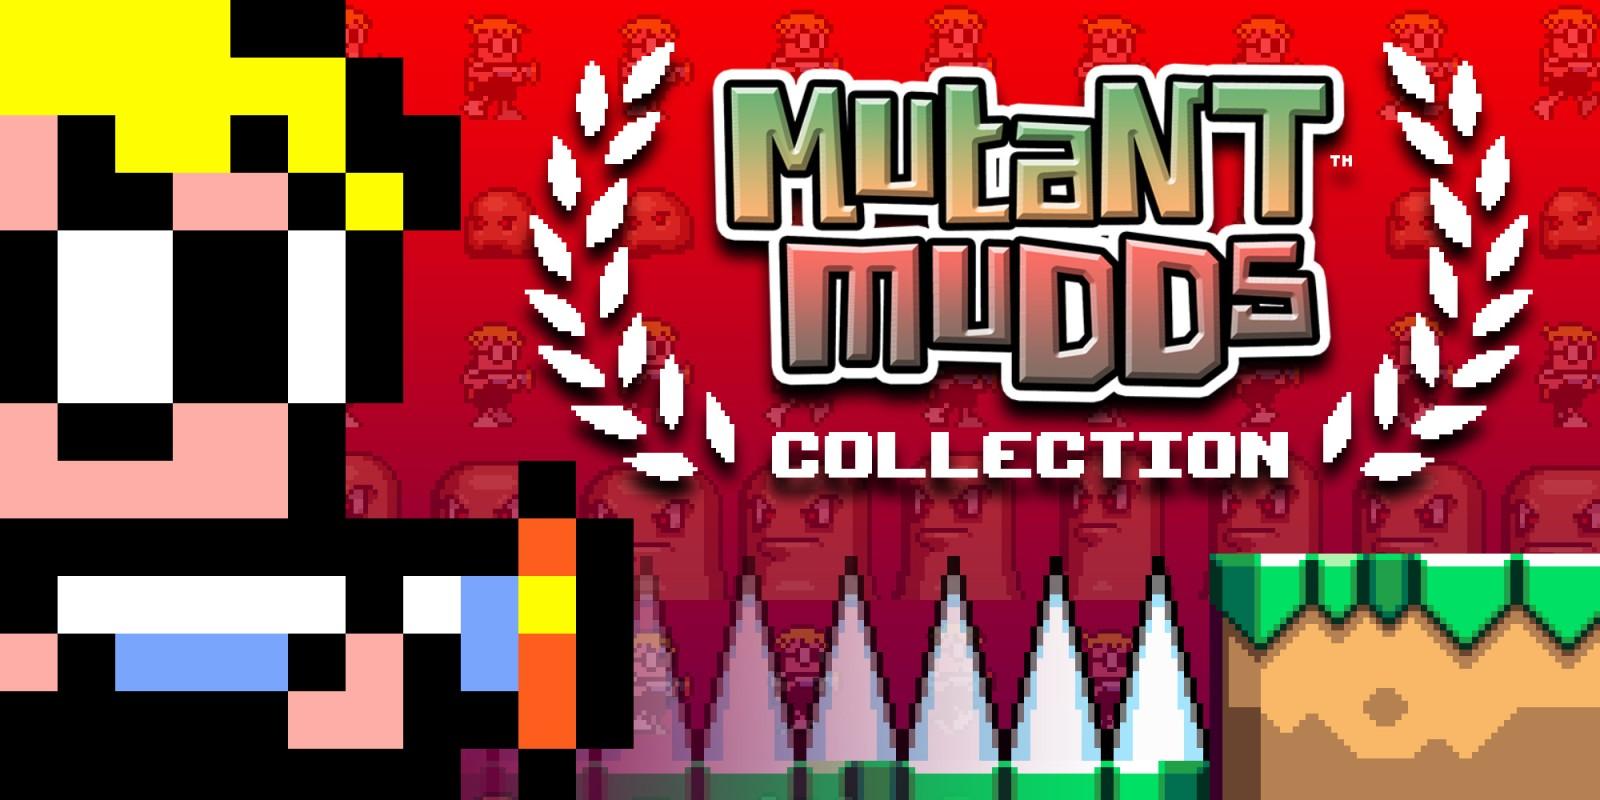 [Nintendo Switch] Mutant Mudds Collection £1.09 @ Nintendo eShop